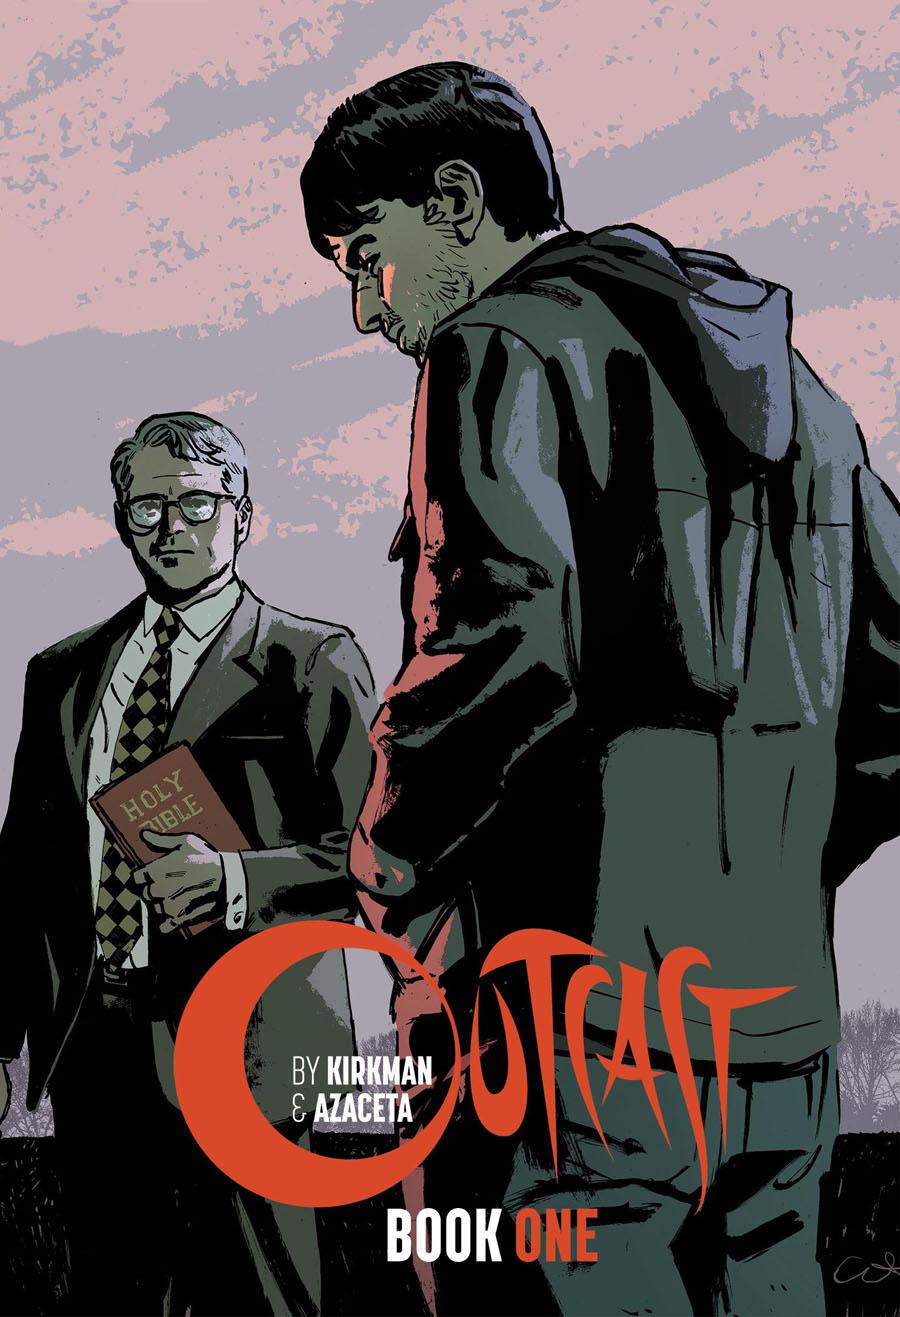 LCSD 2016 Outcast By Kirkman & Azaceta Book 1 HC Variant Cover